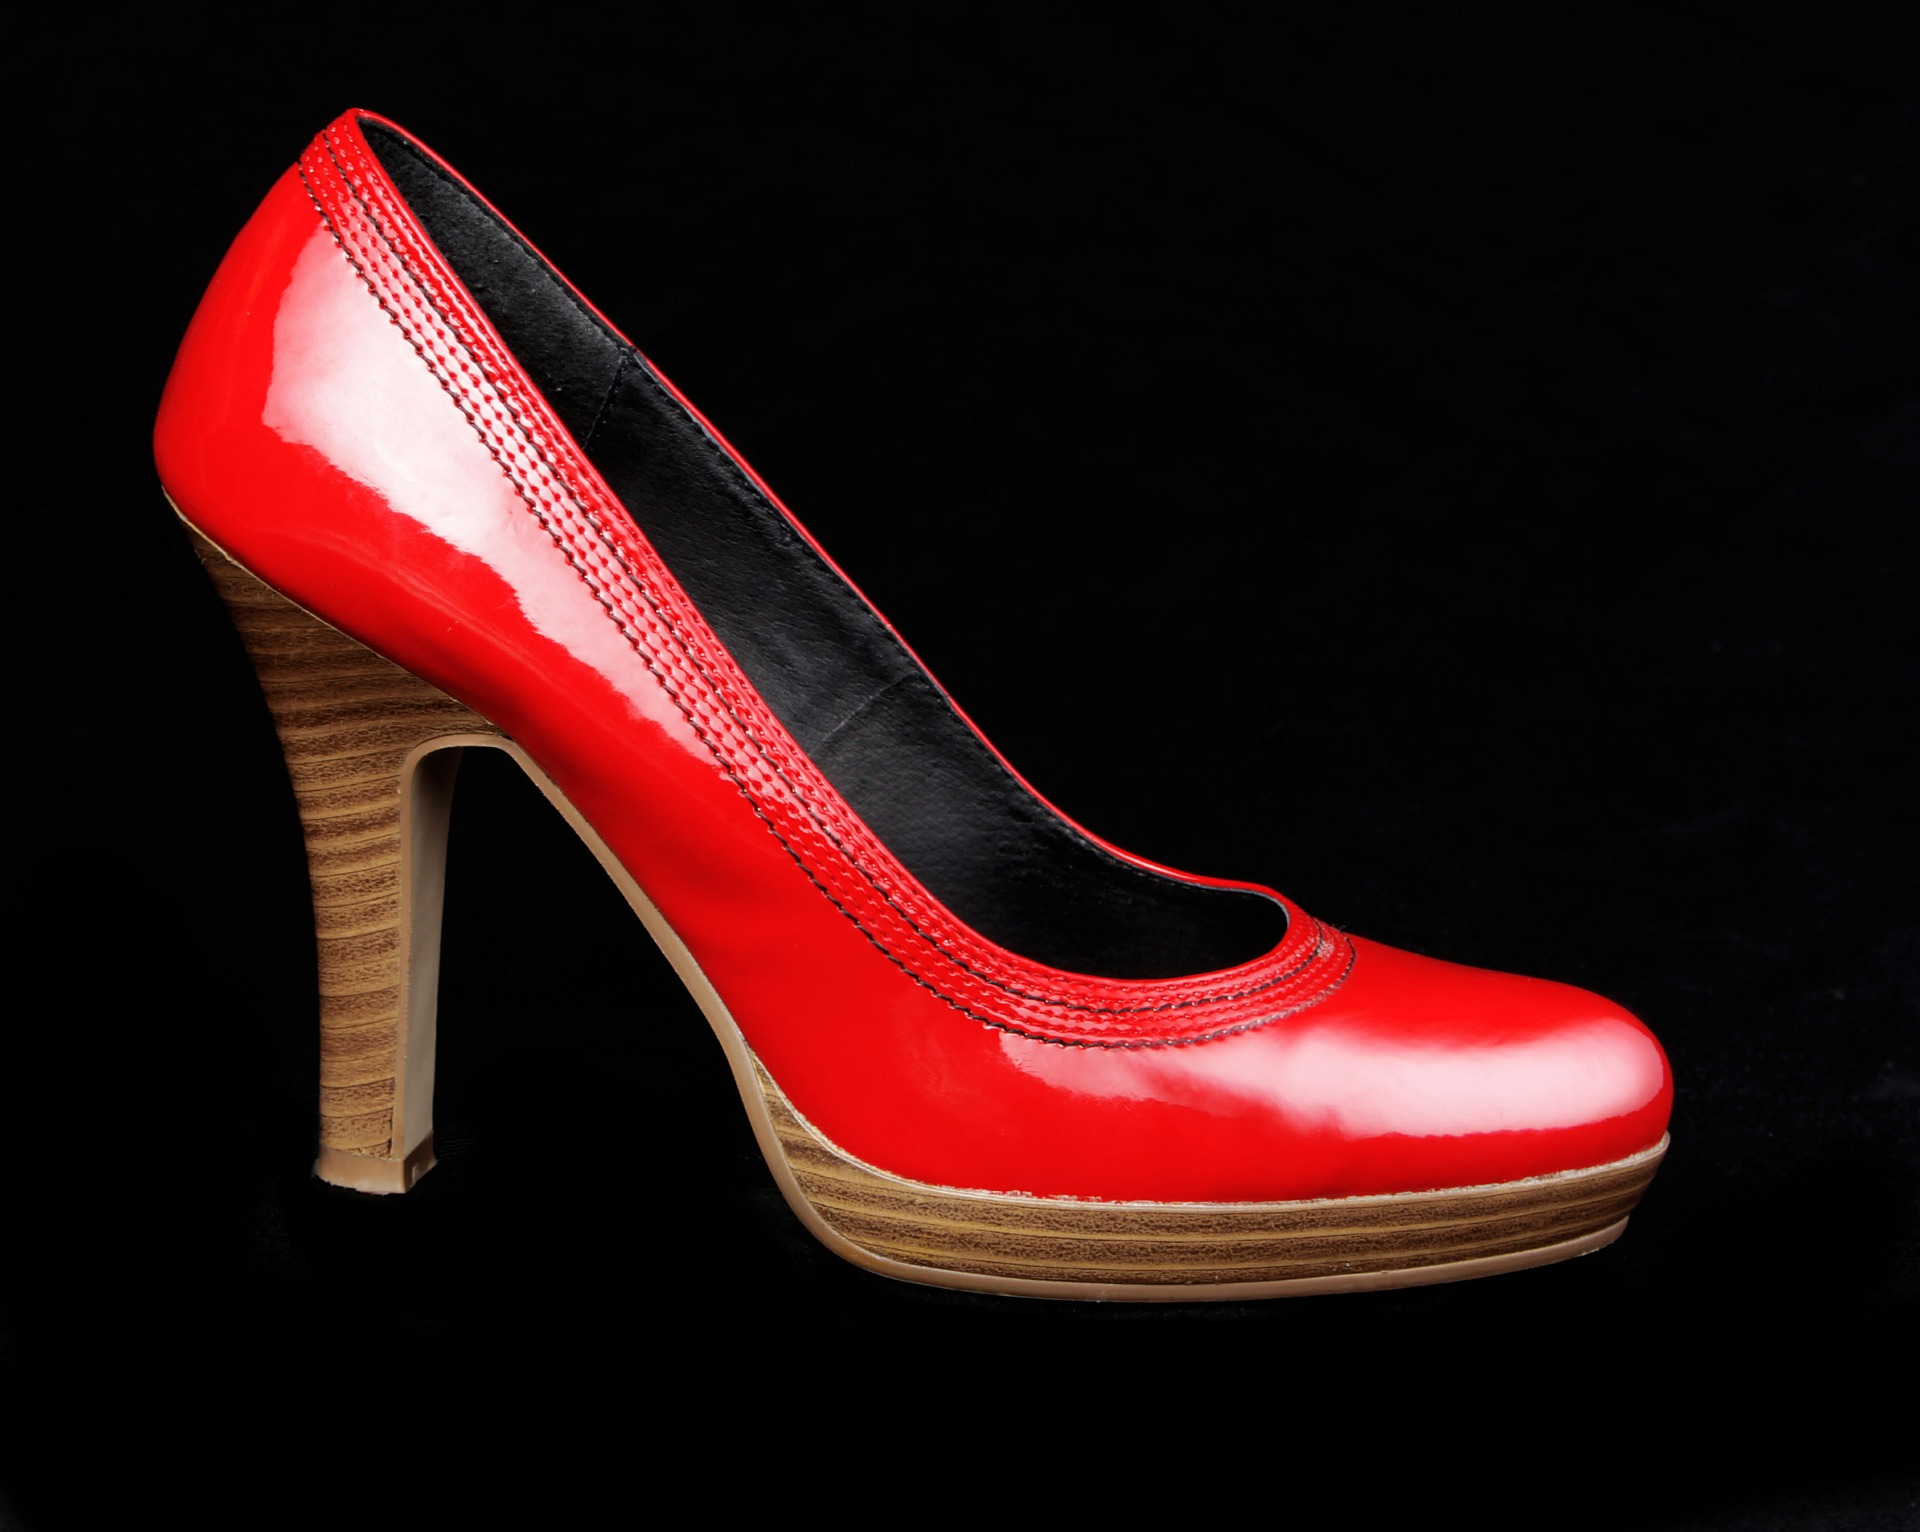 shoes-361406_1920.jpg